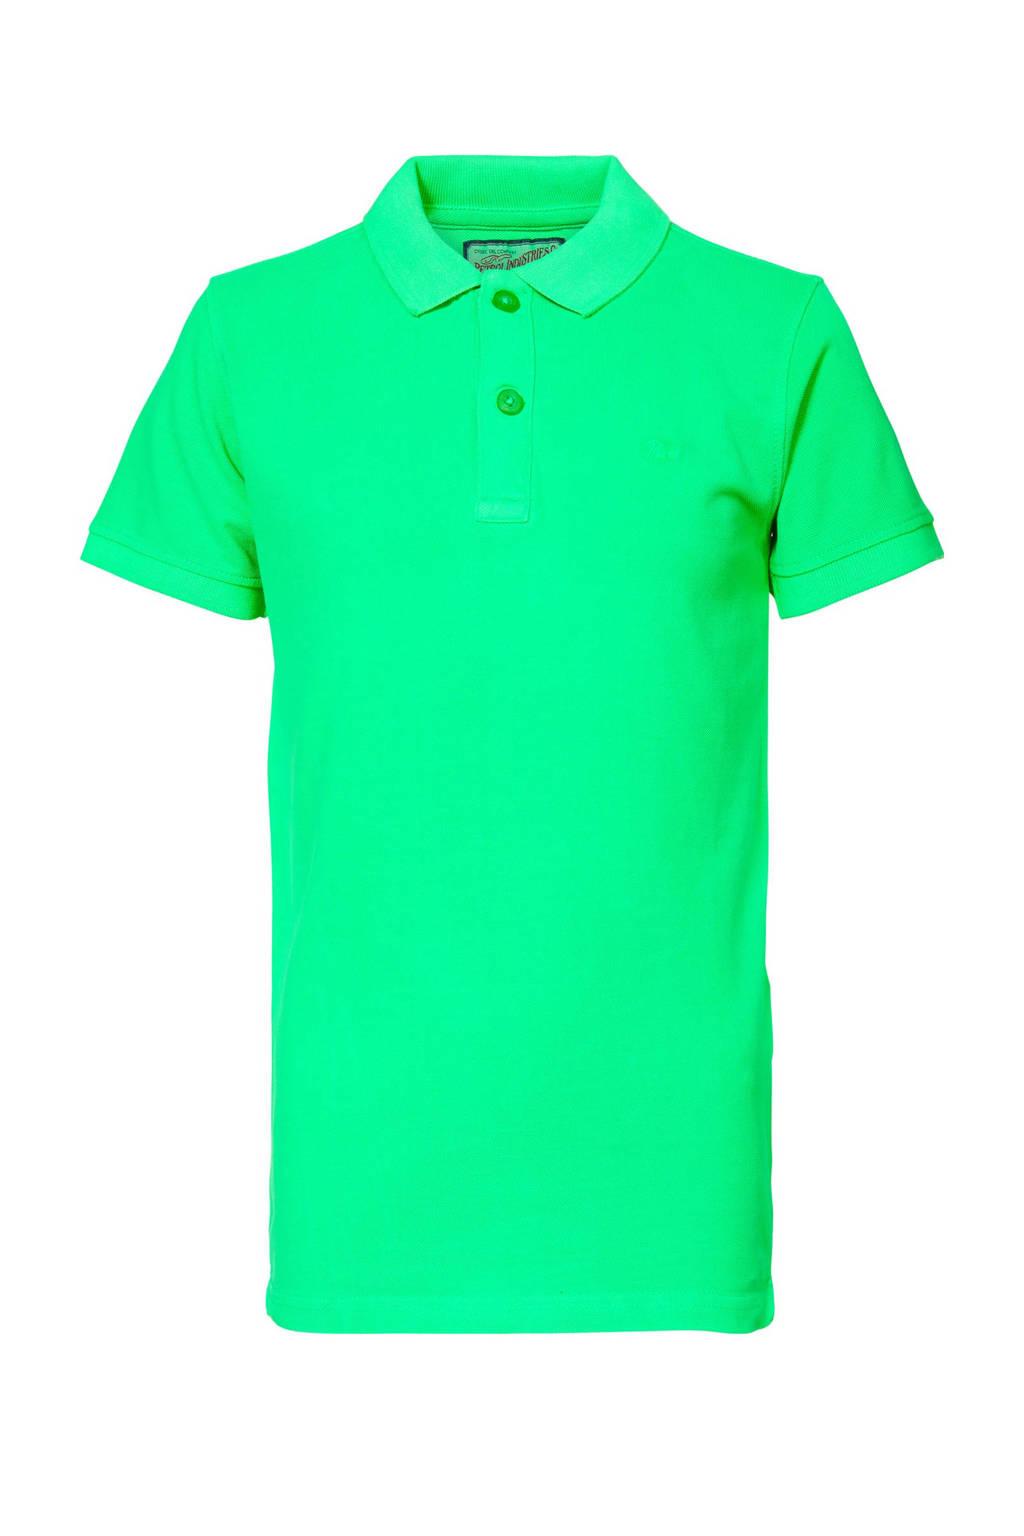 Petrol Industries polo neon groen, Neon groen